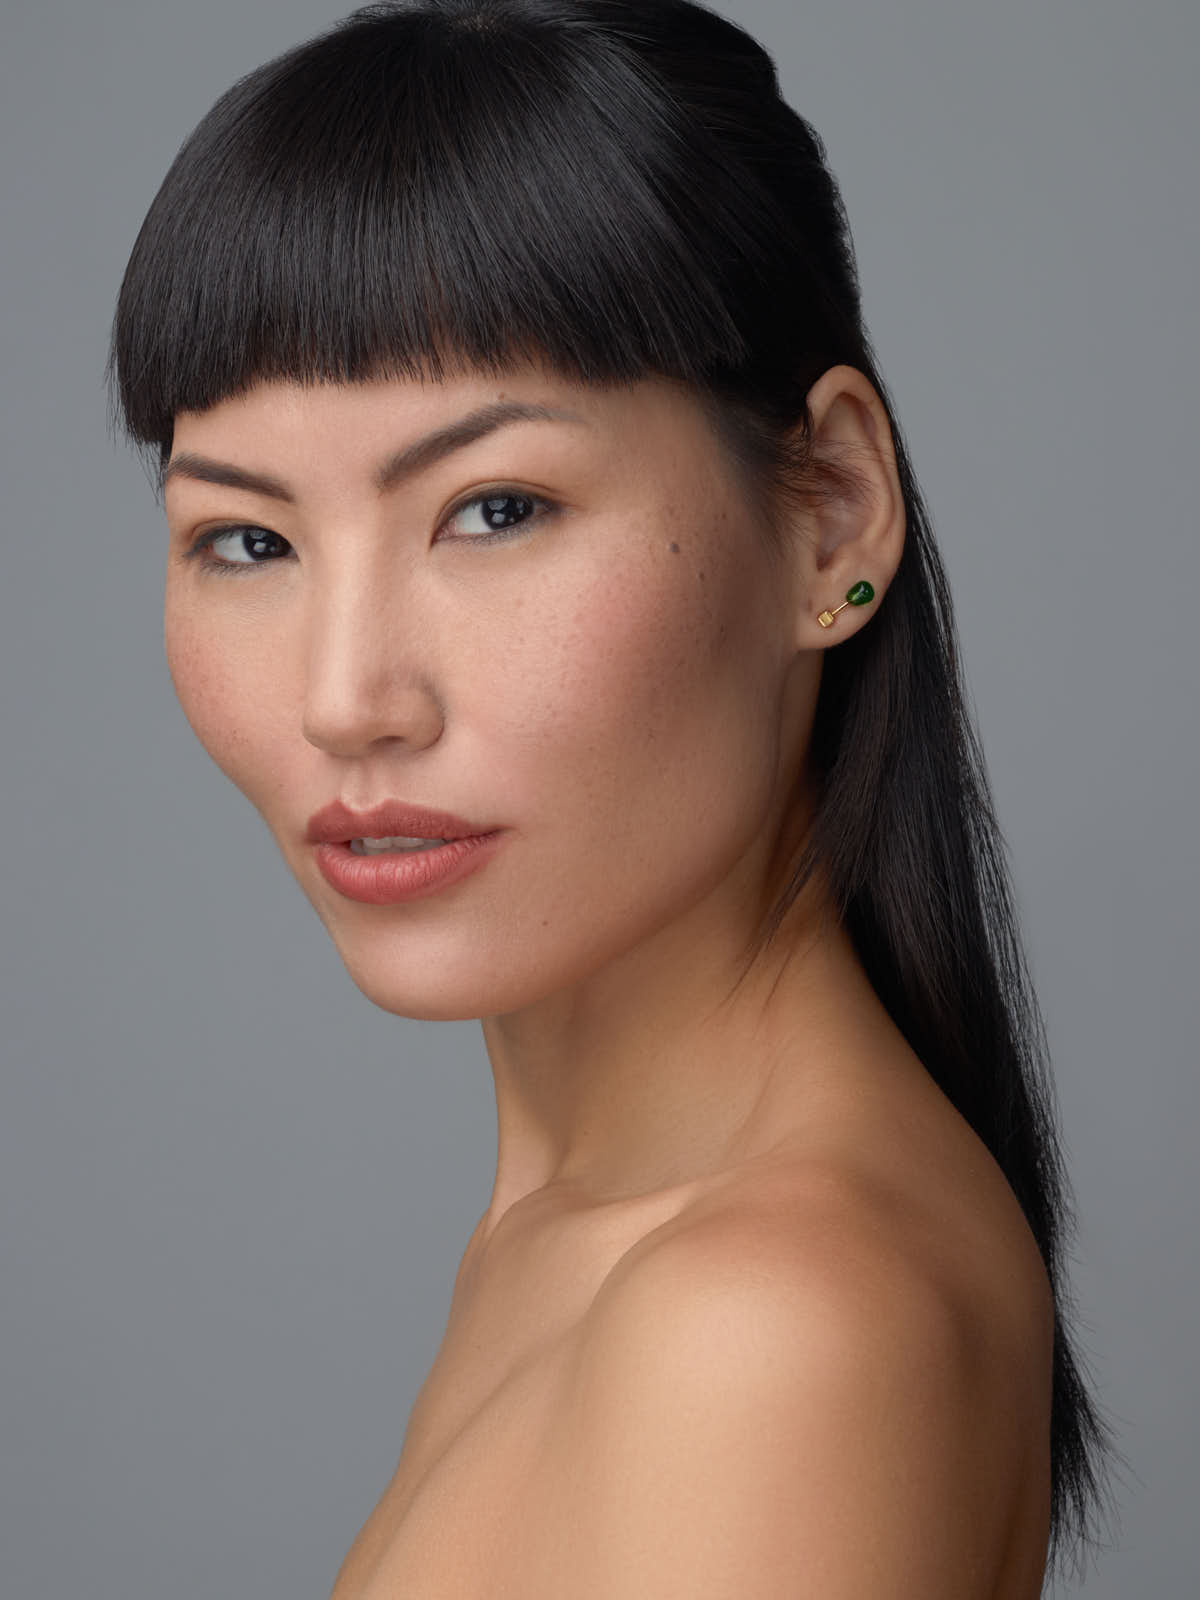 sce-agency-female-model-tia-b-1a